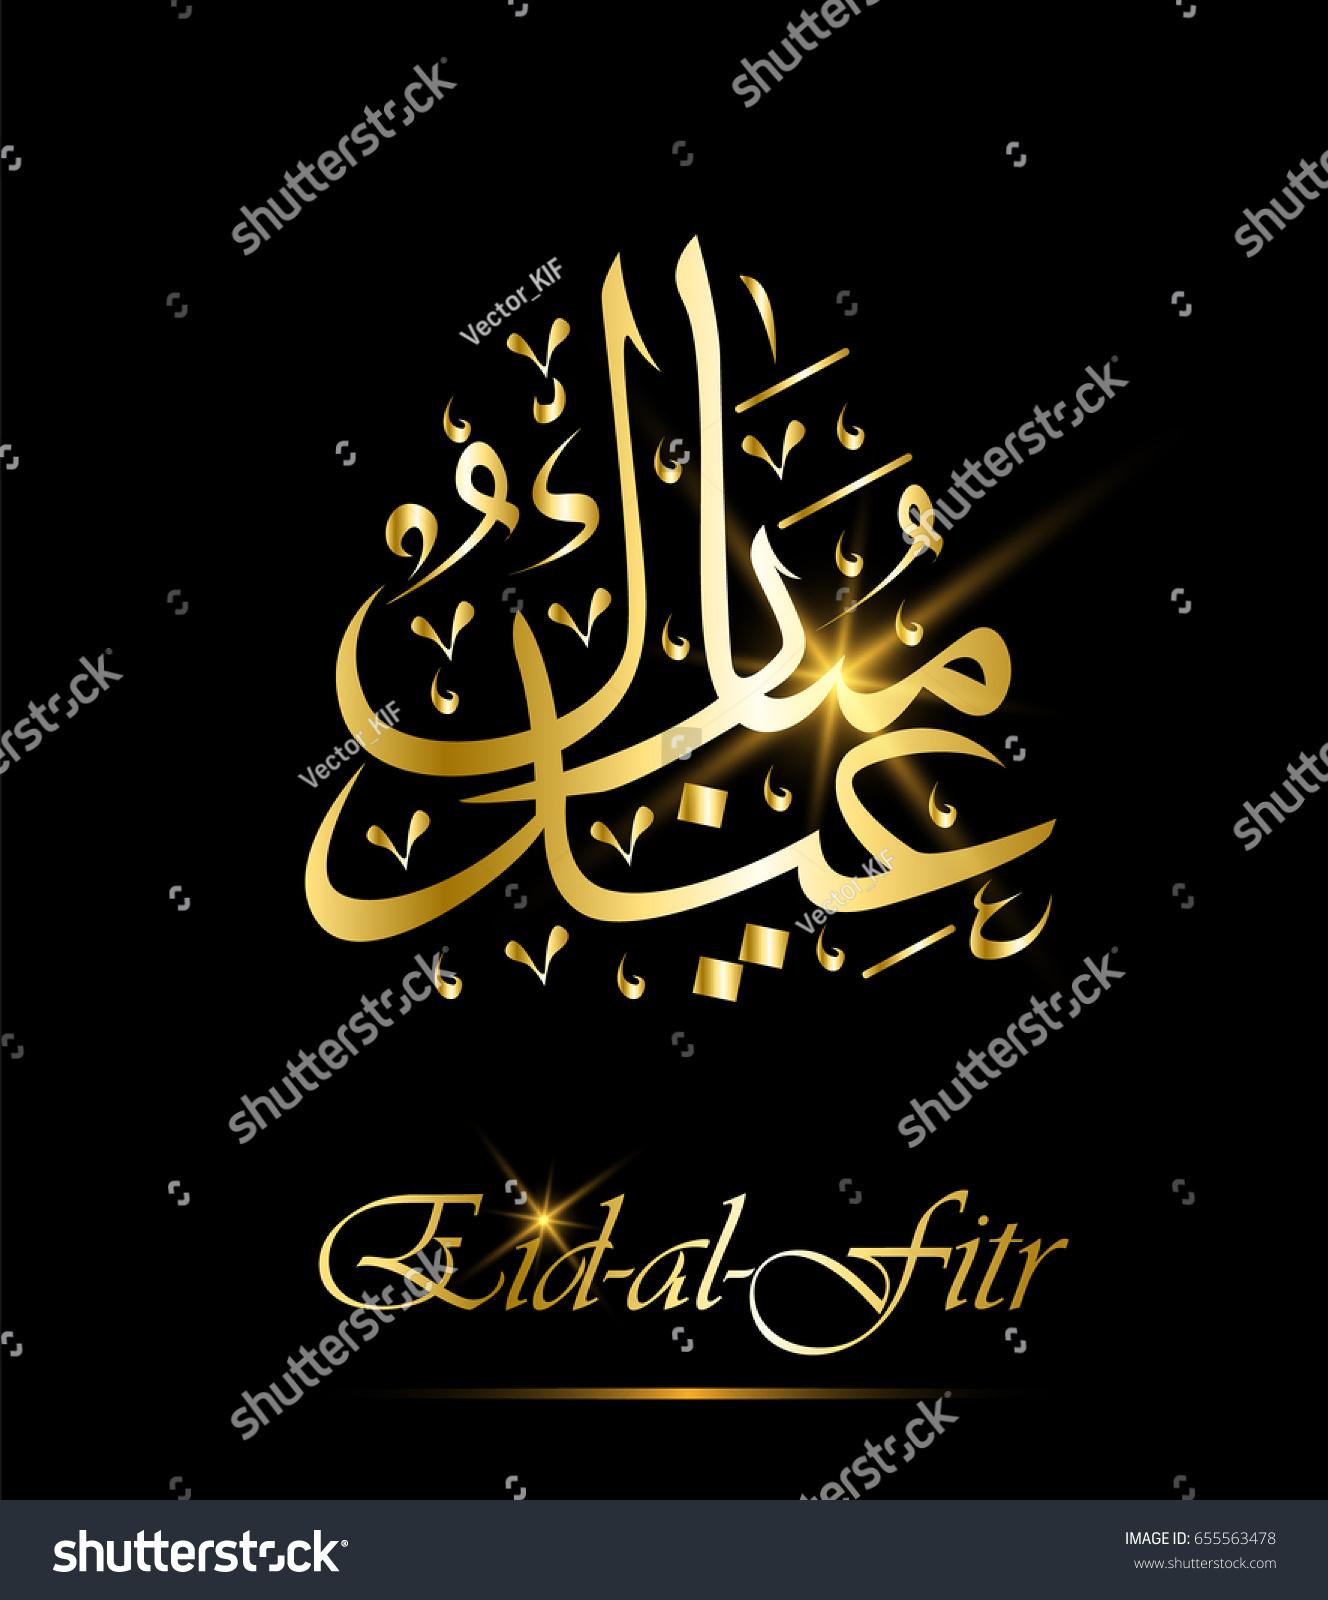 Wonderful Idd Eid Al-Fitr Greeting - stock-vector-eid-al-fitr-greeting-card-golden-lanterns-and-calligraphy-on-black-background-vector-illustration-655563478  You Should Have_937848 .jpg